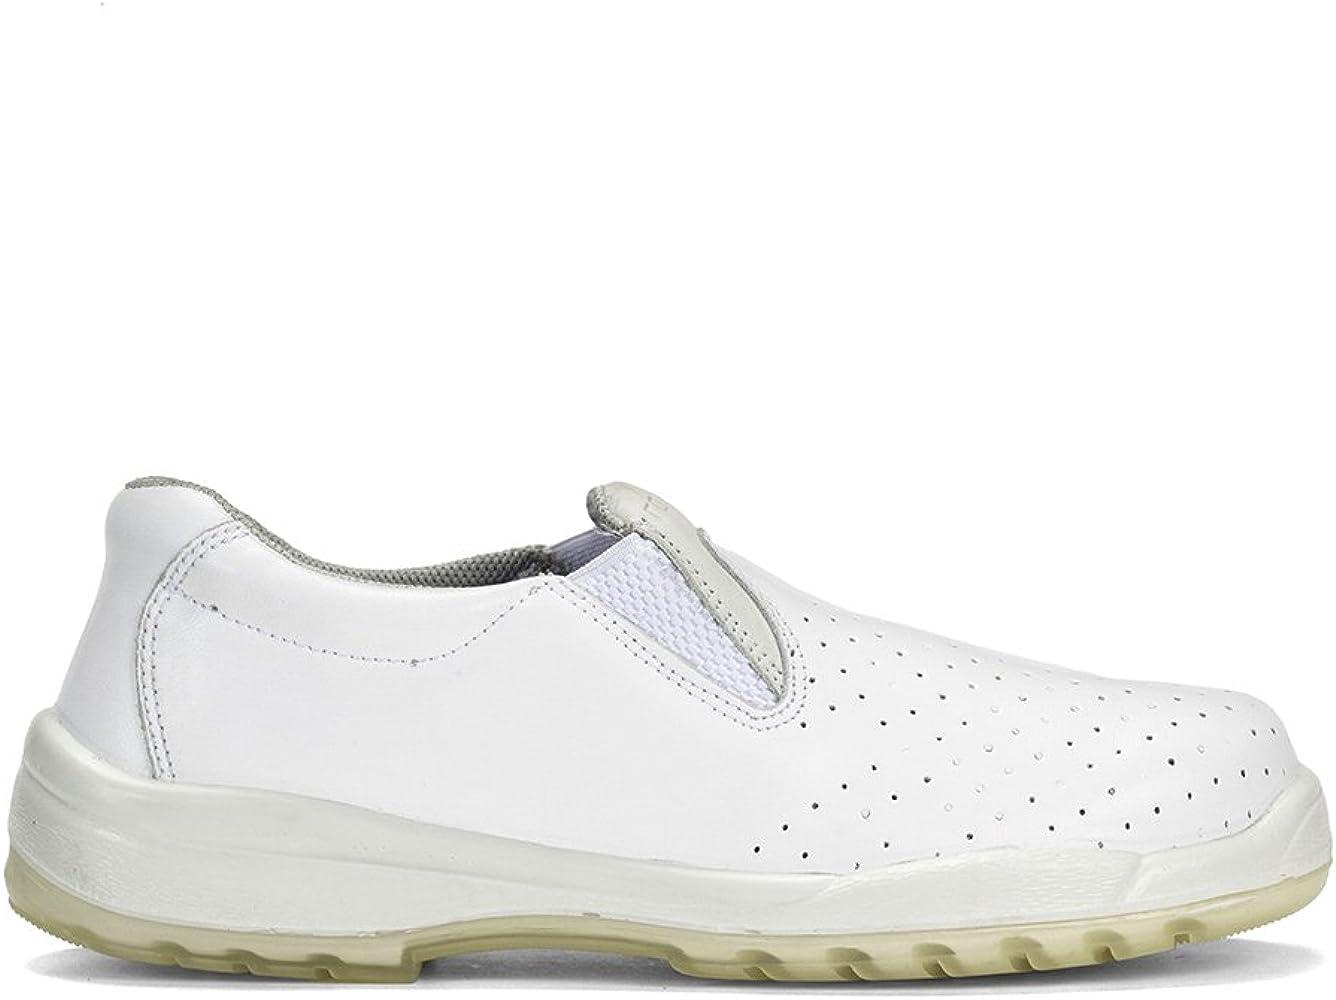 Robusta-Zapato Anatómico Sanitario Carmen O1 Blanco: Amazon.es ...